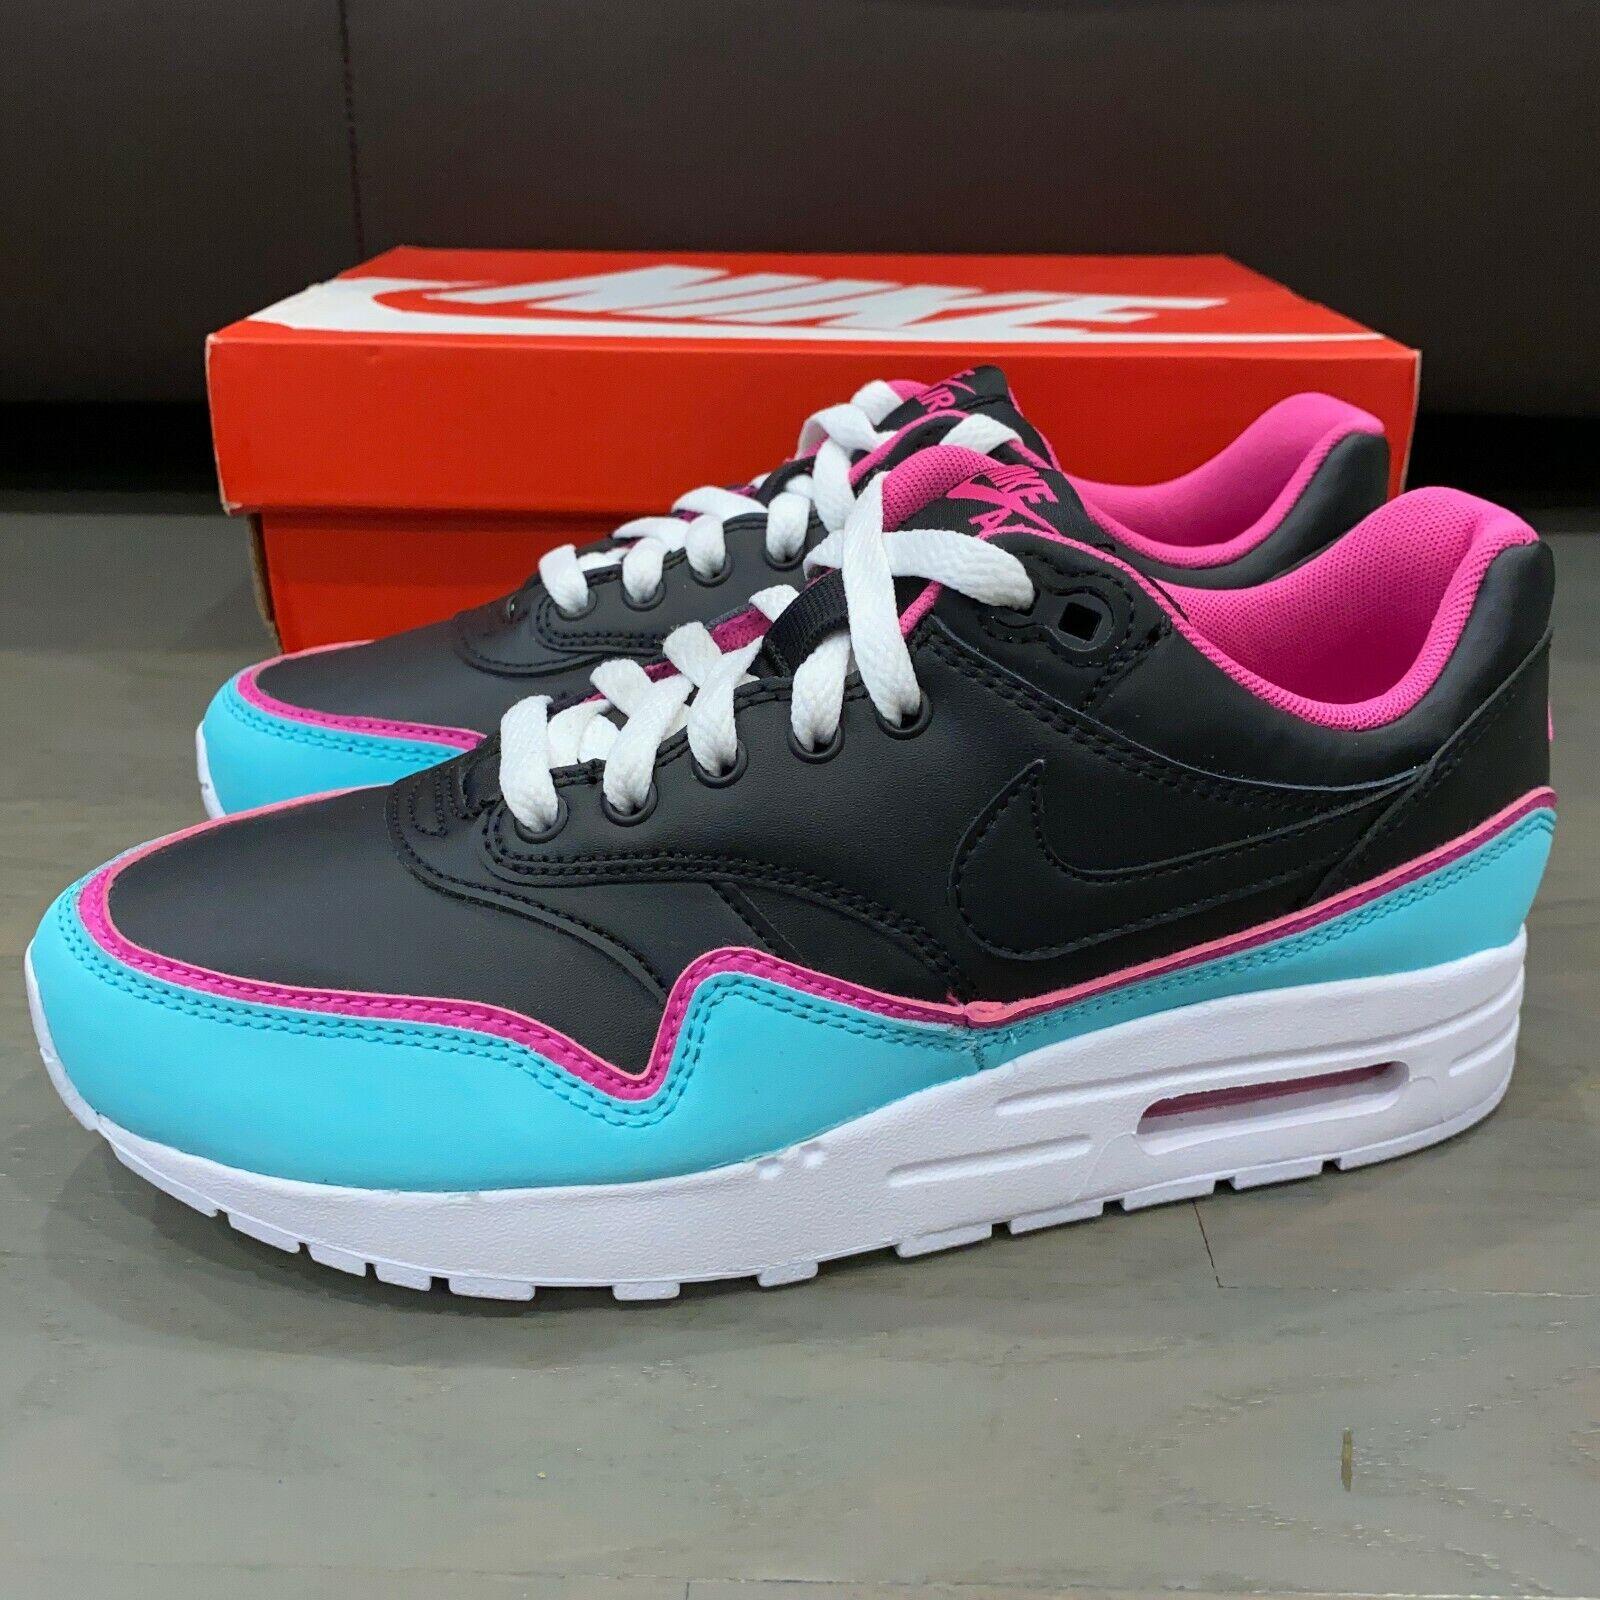 Nike Air Max 1 GS Double Layered Aqua Fuchsia Youth 6.5Y / Women 8 BV0052-001